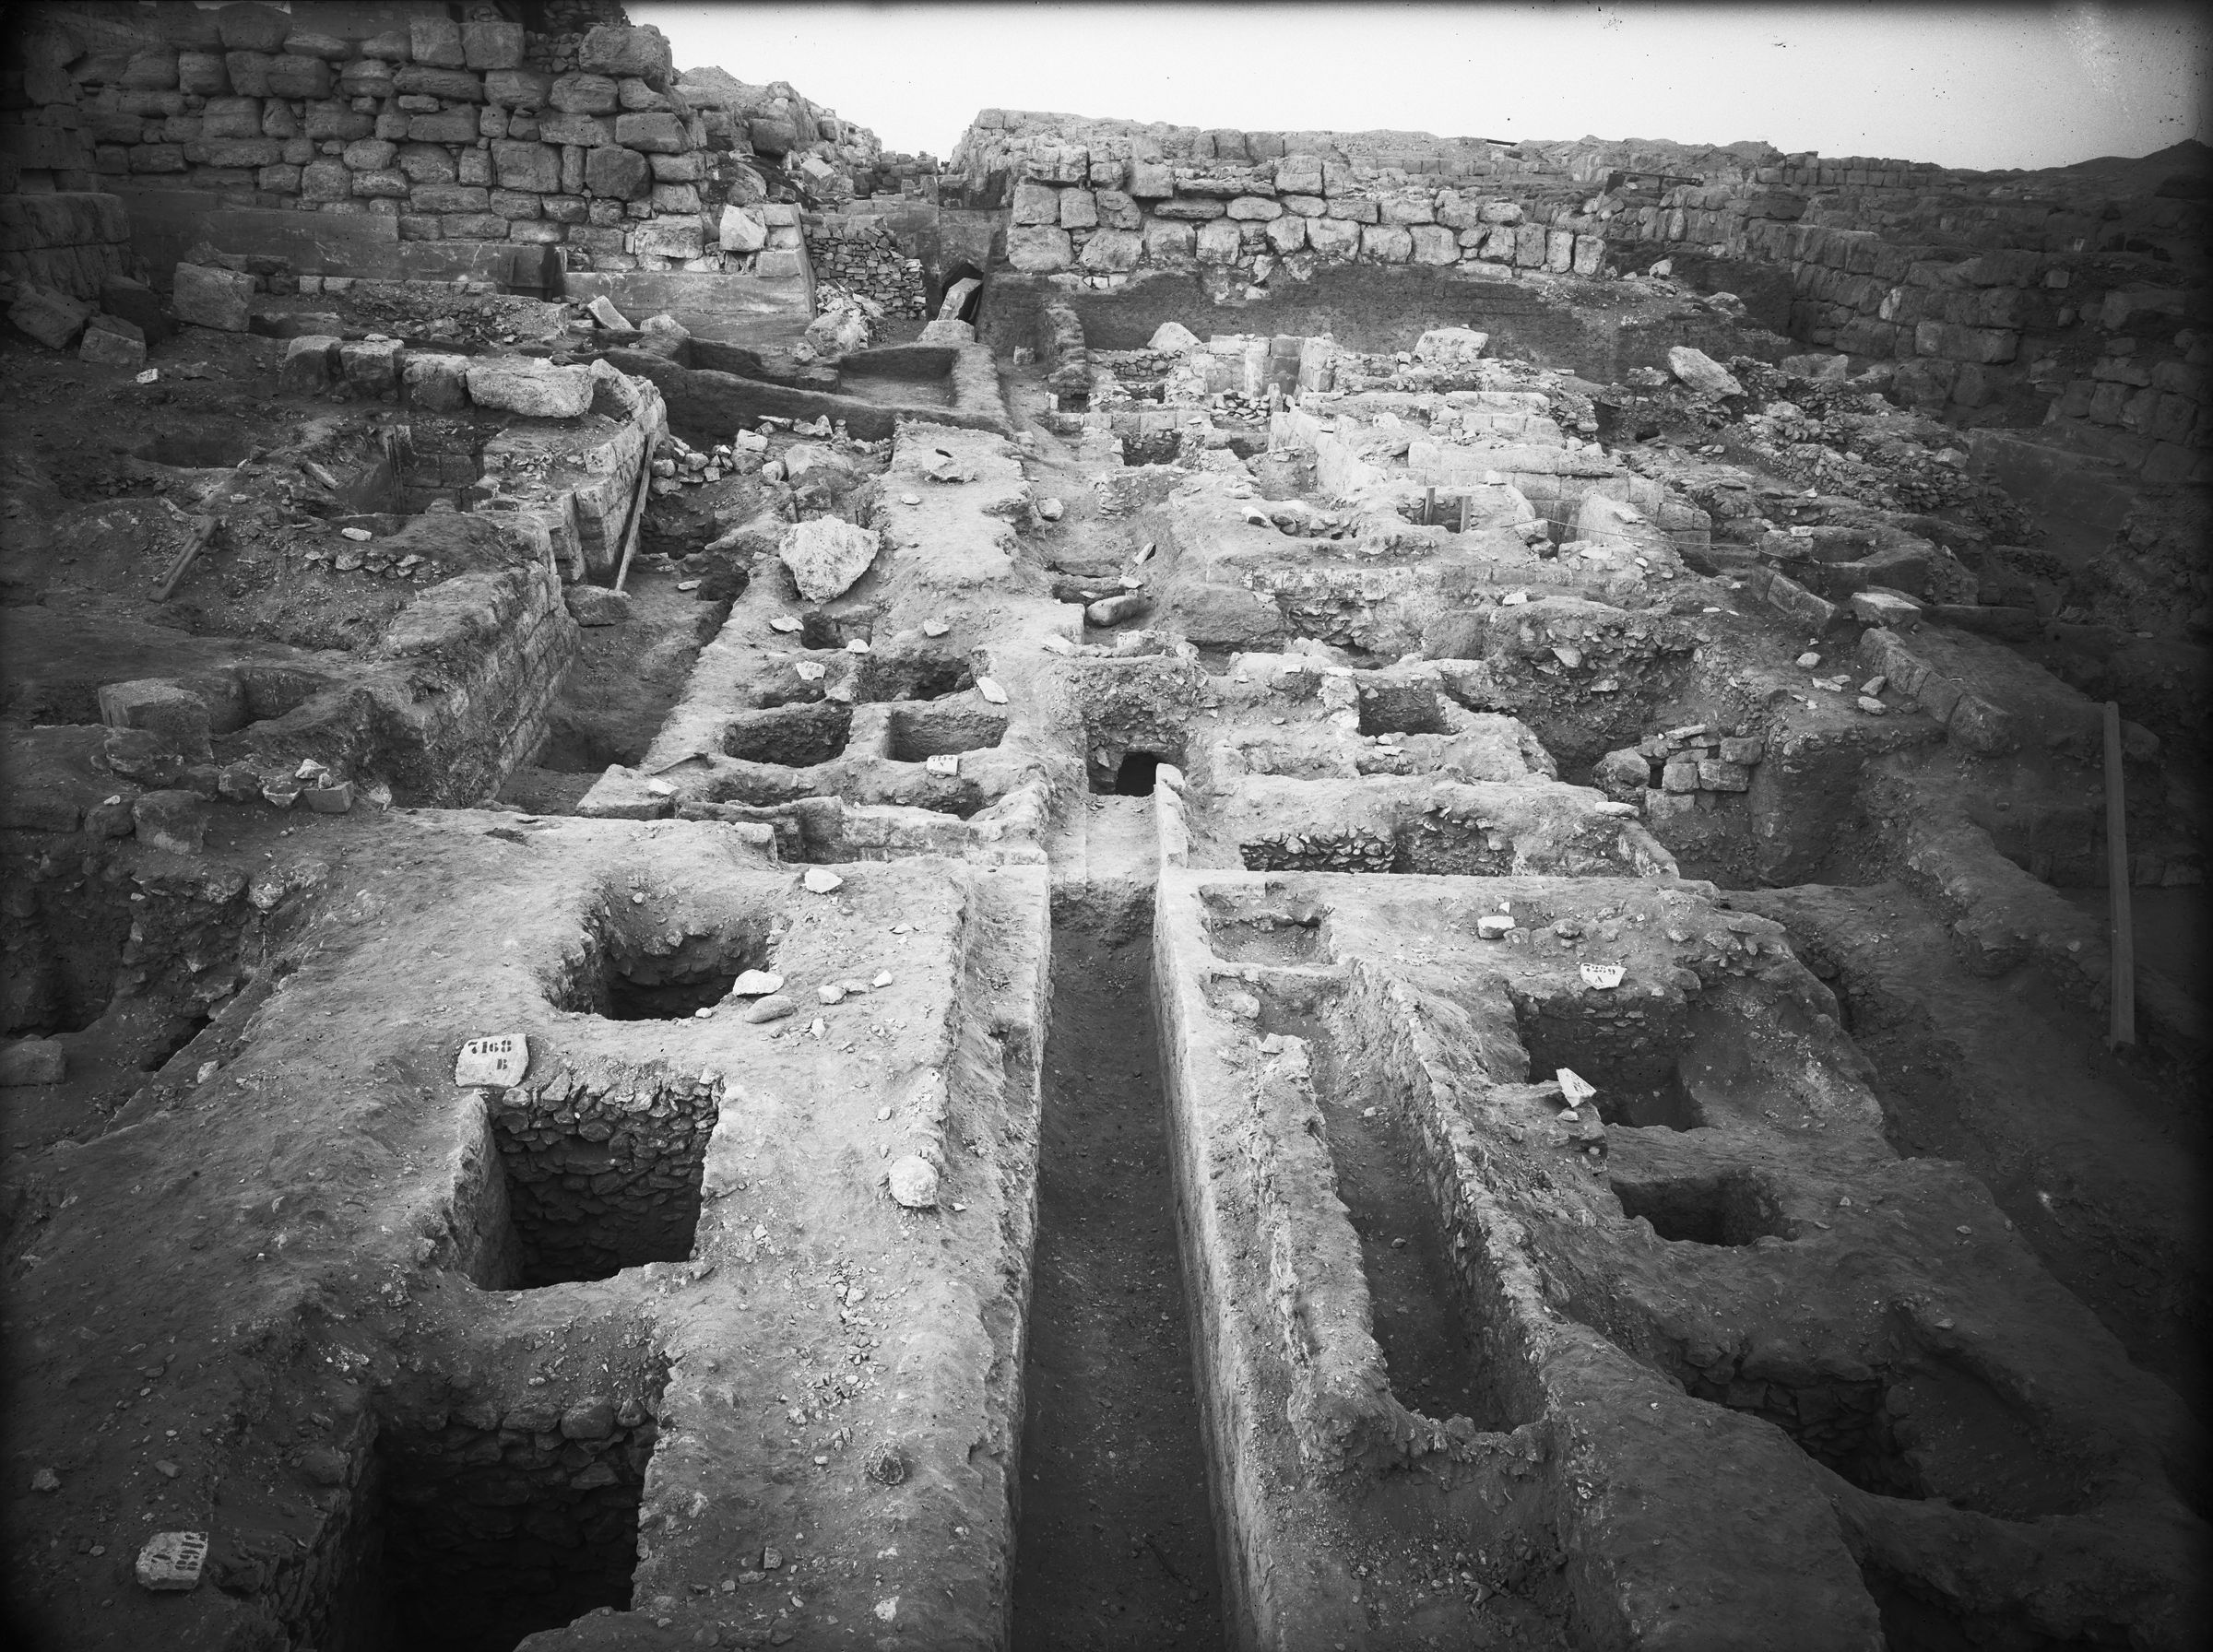 Eastern Cemetery: Site: Giza; View: G 7168, G 7259, G 7143, G 7144, G 7146, G 7253, G 7254